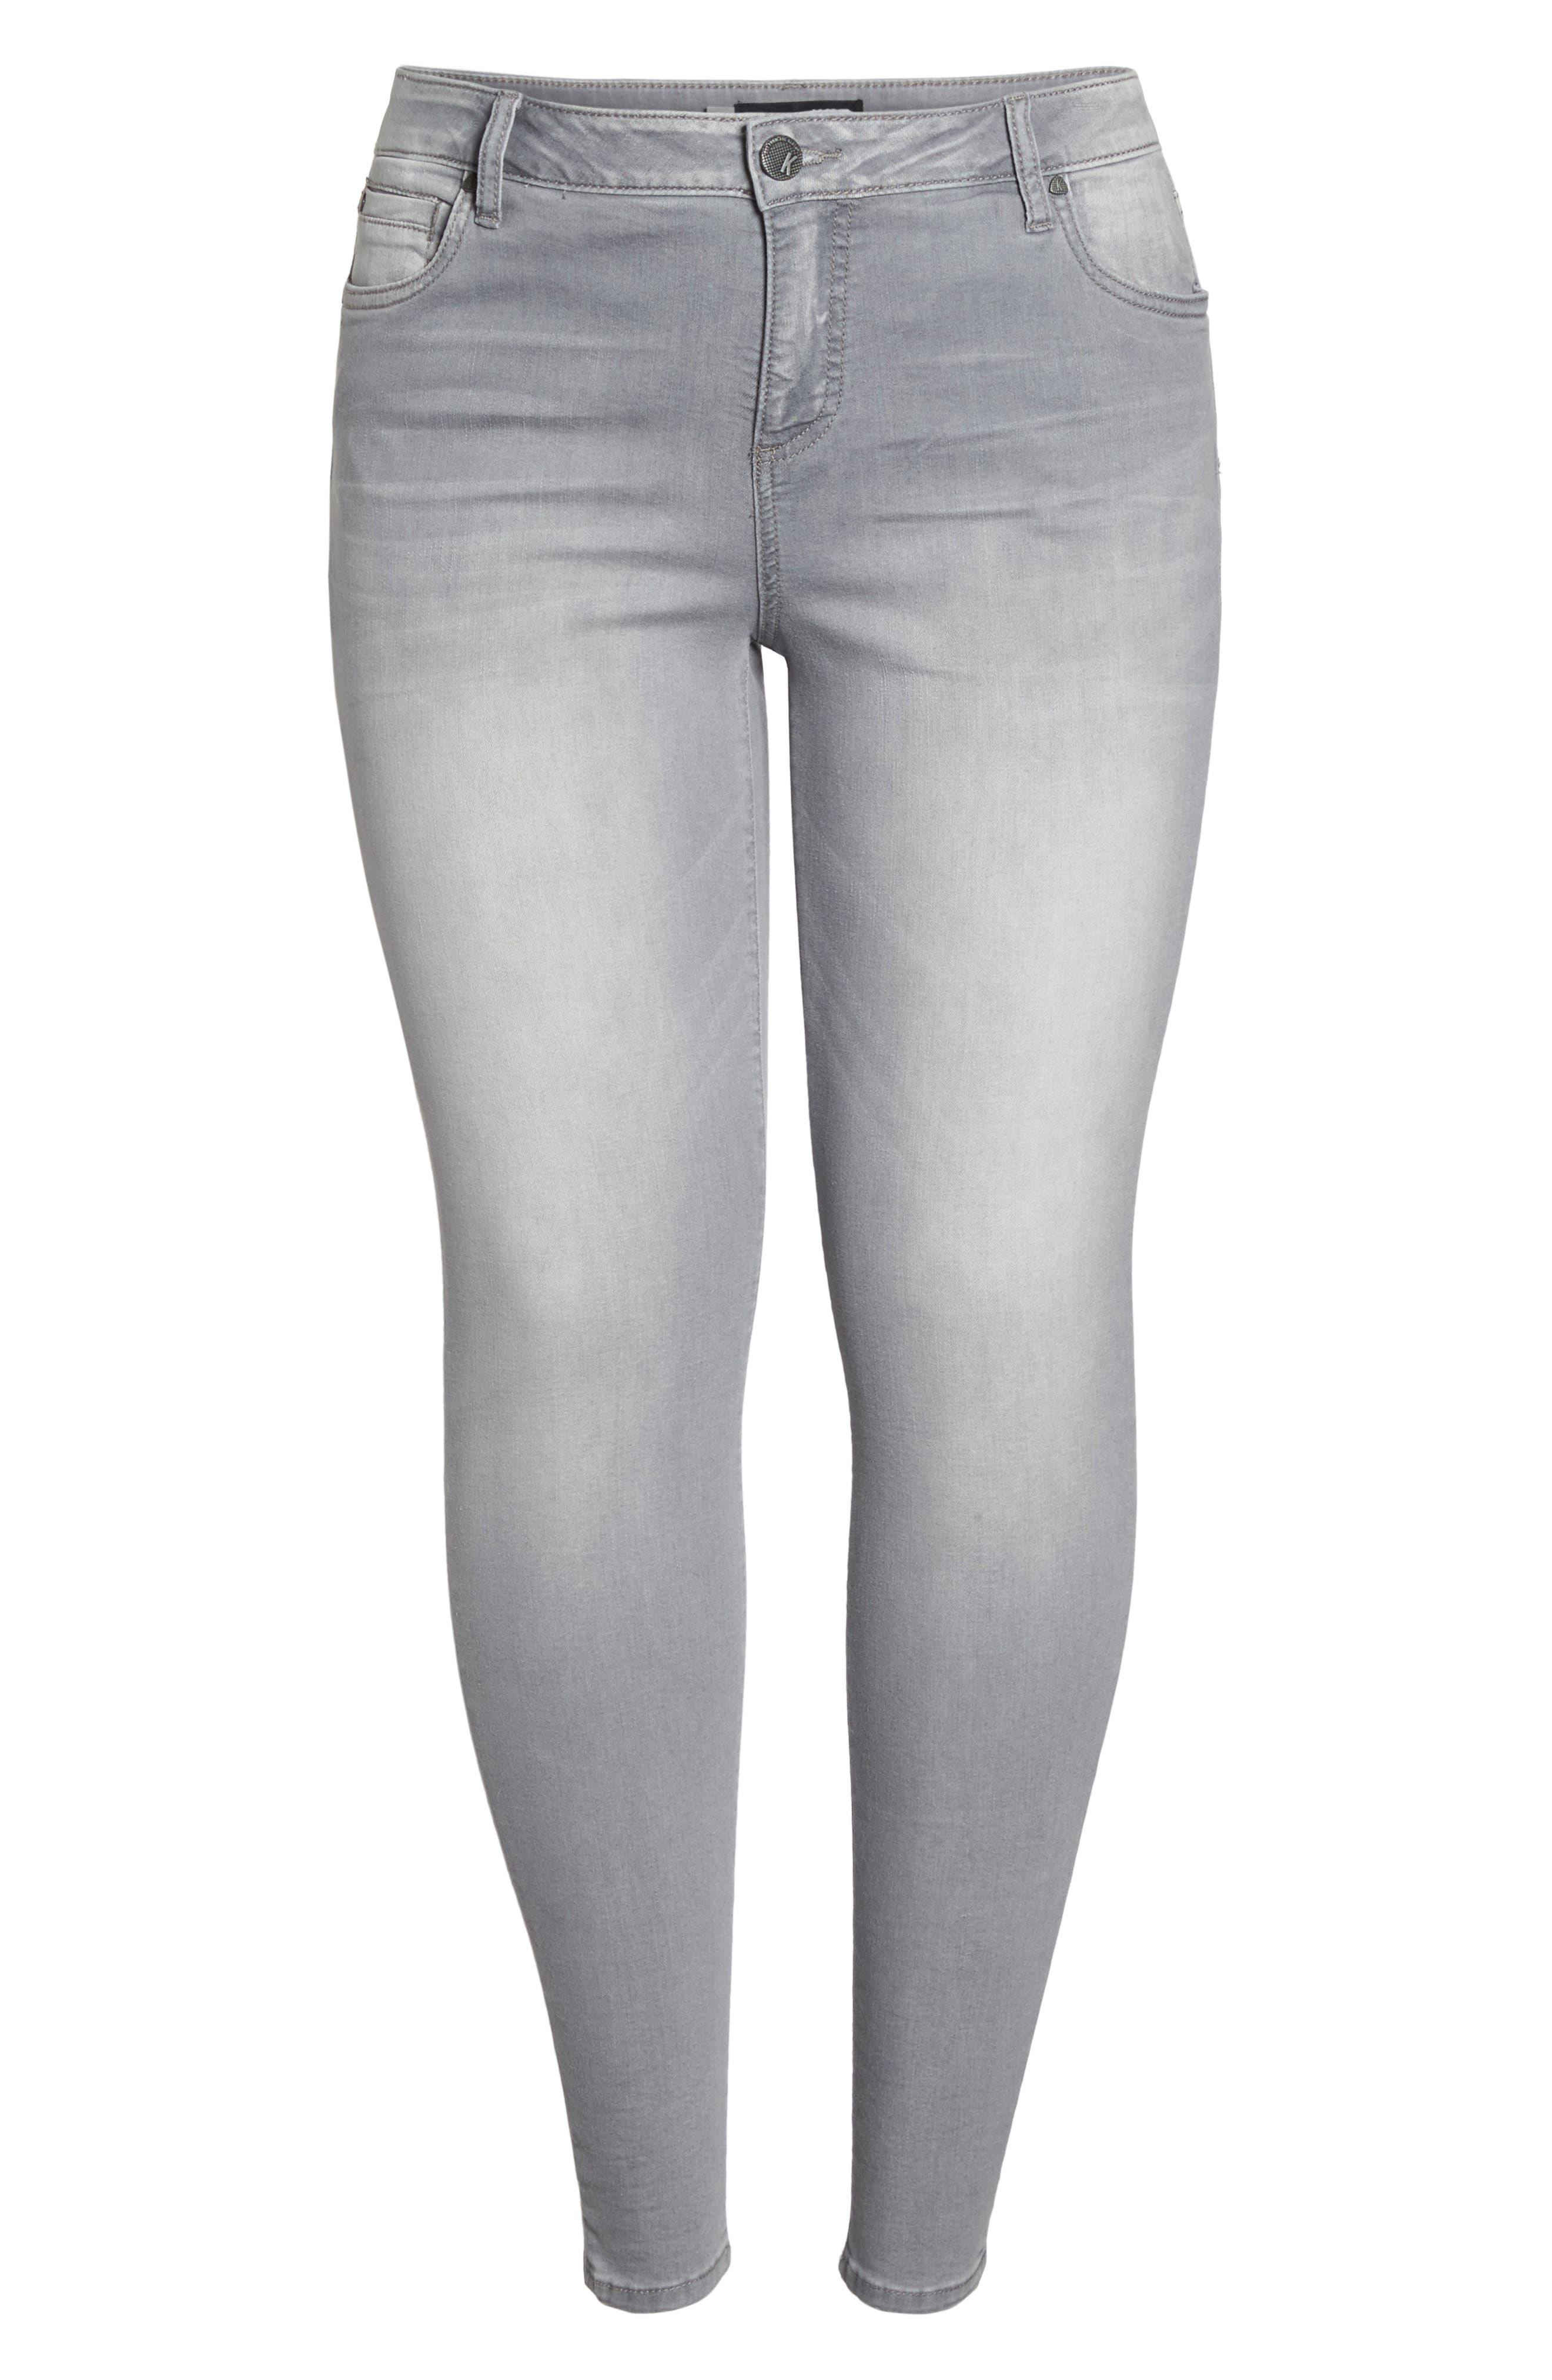 Mia Skinny Jeans,                             Alternate thumbnail 6, color,                             Prevailed